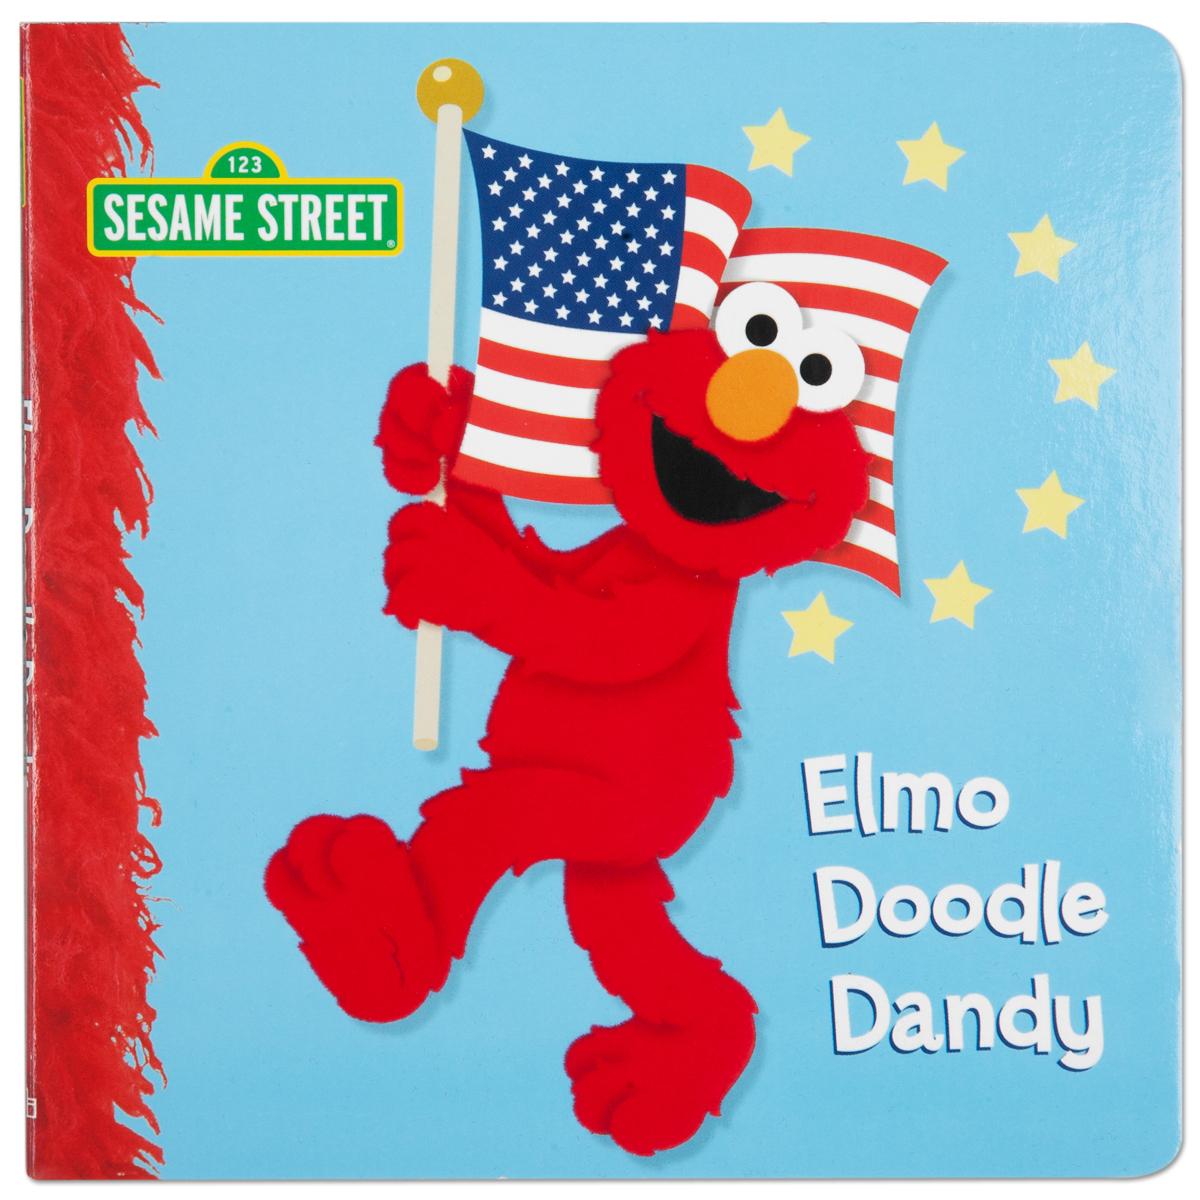 Elmo Doodle Dandy Book